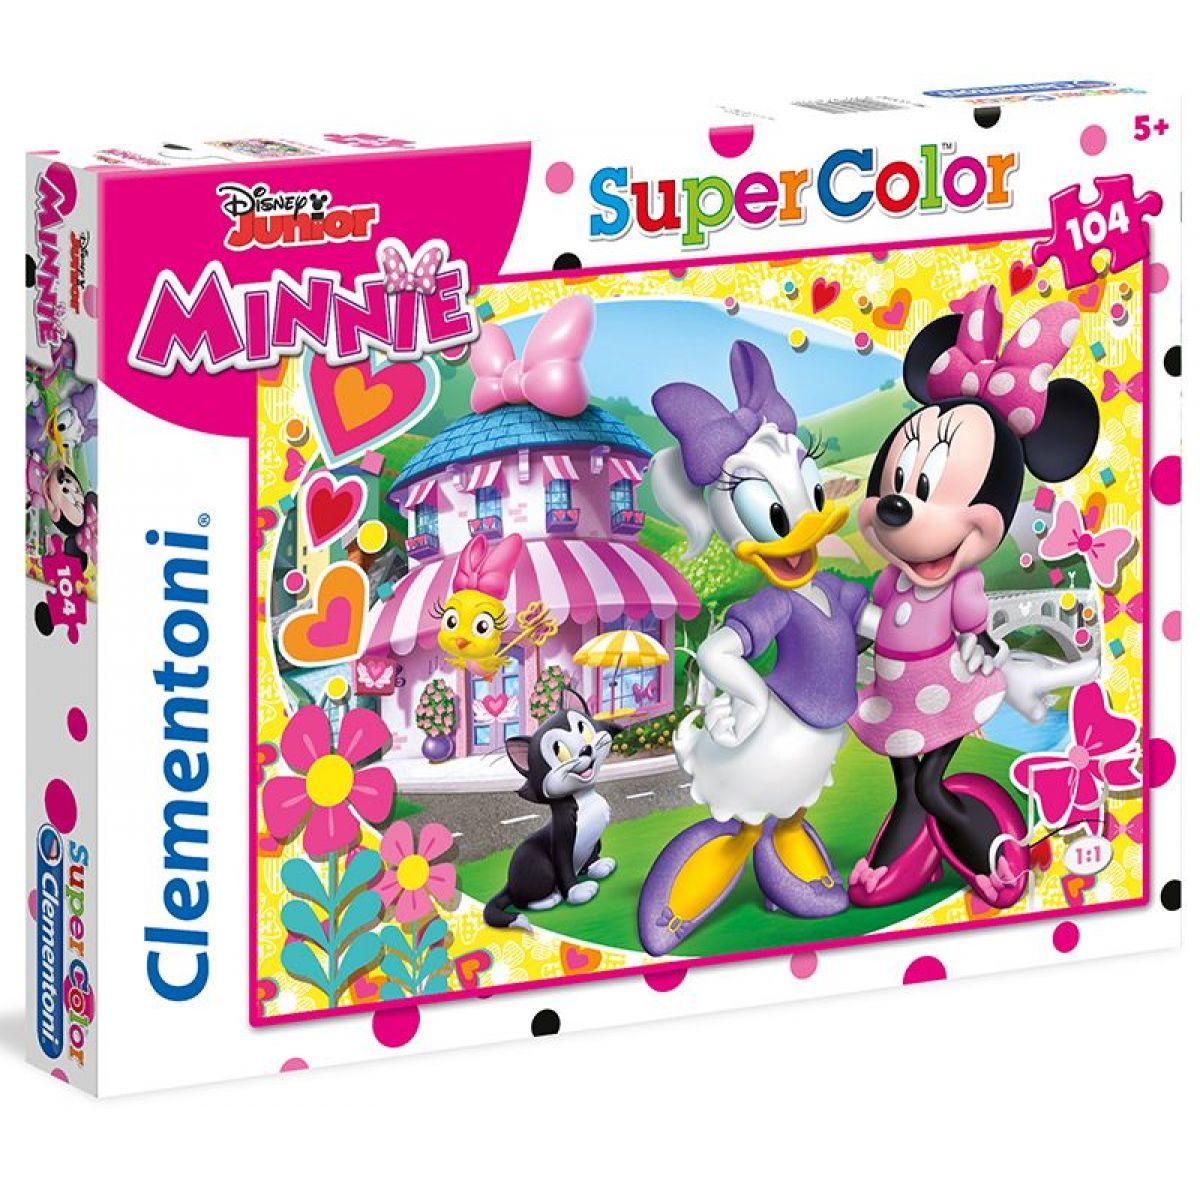 Clementoni Minnie Supercolor 104 dílků